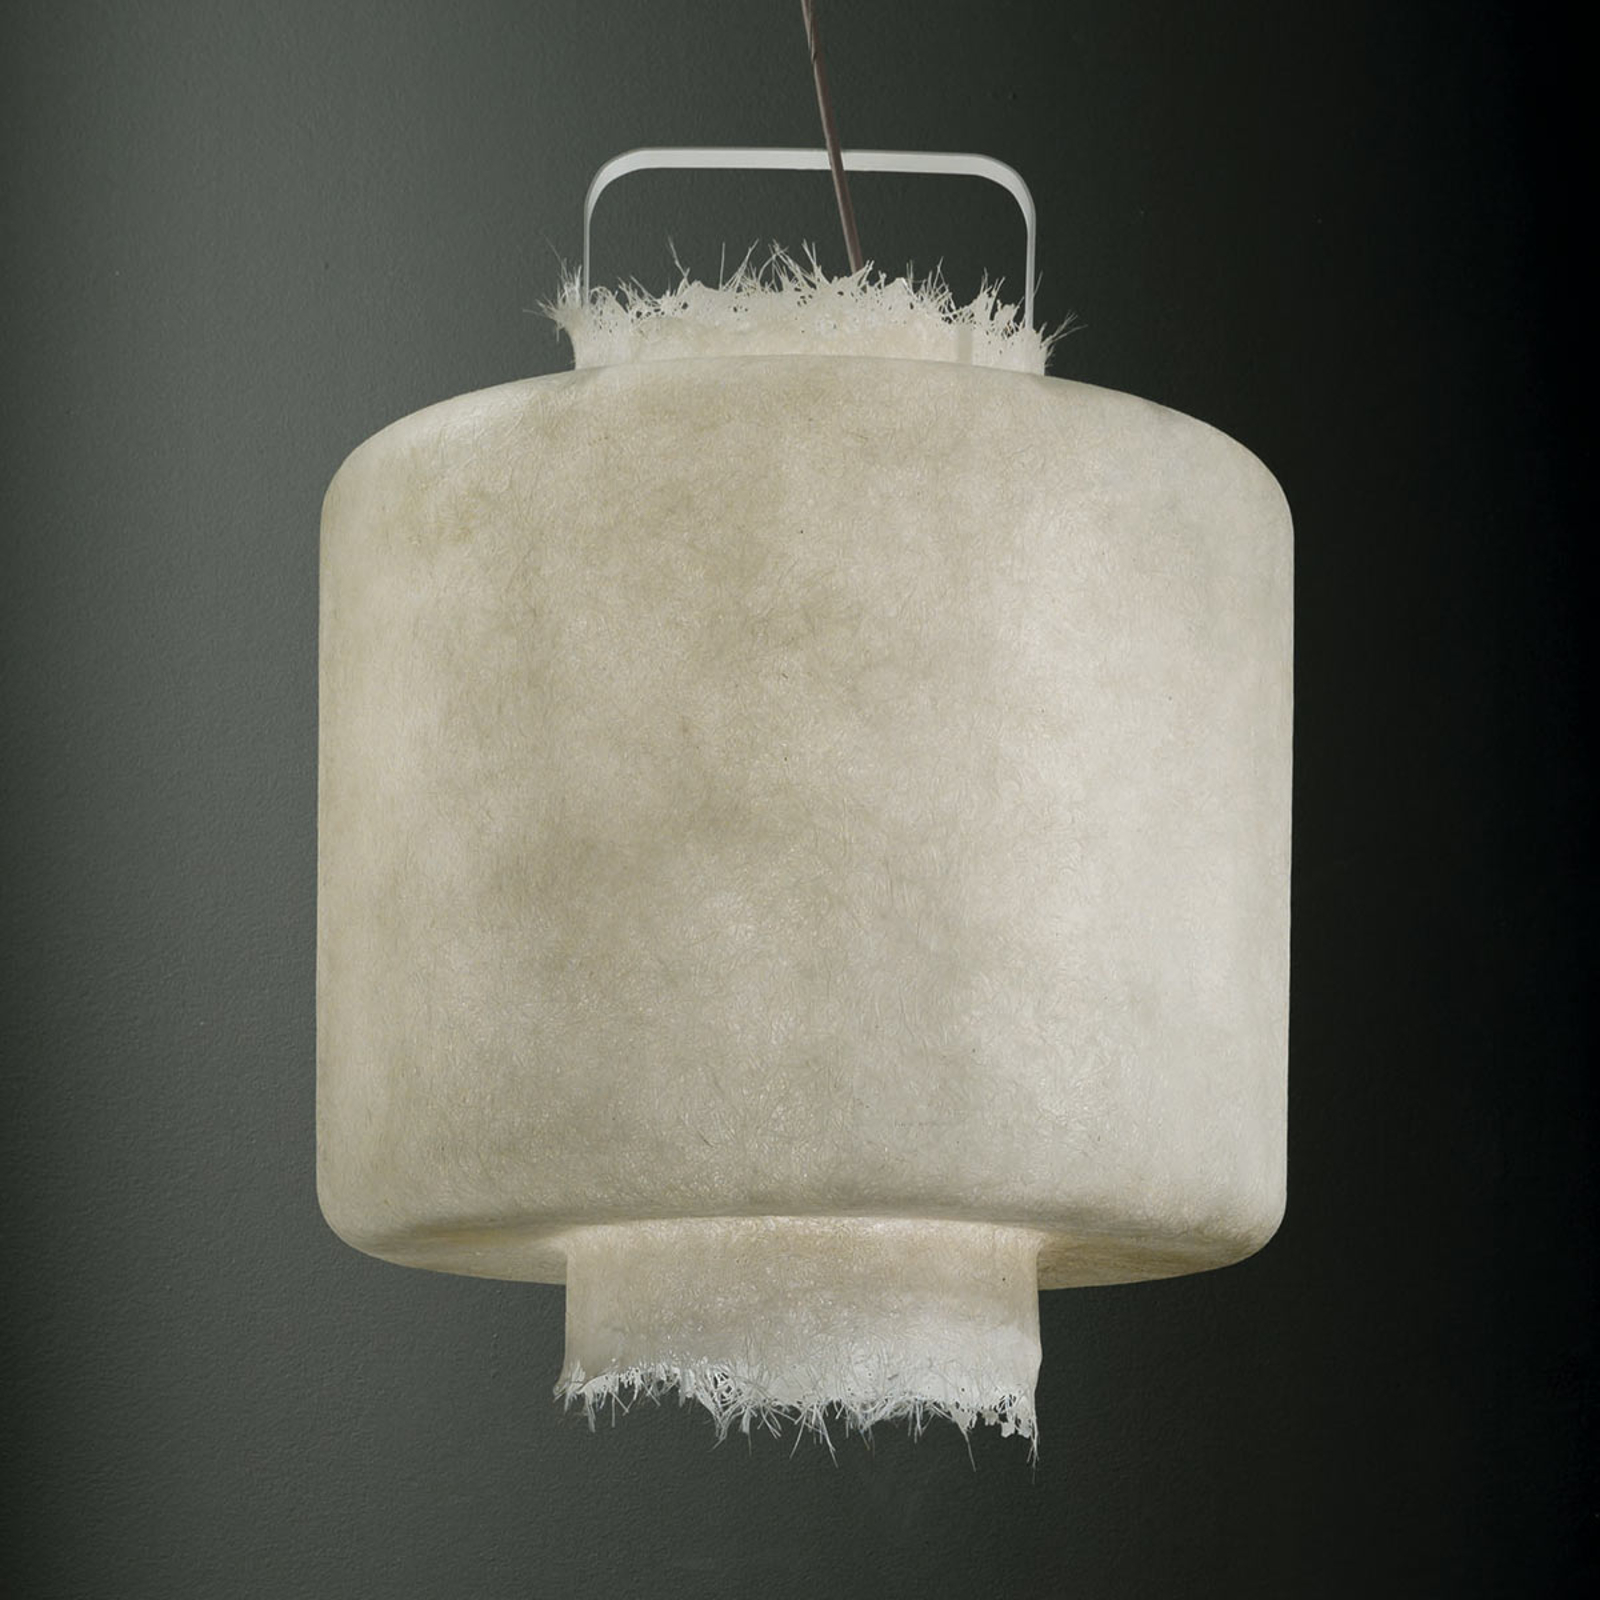 Karman Kimono - hvid LED-hængelampe 50 cm